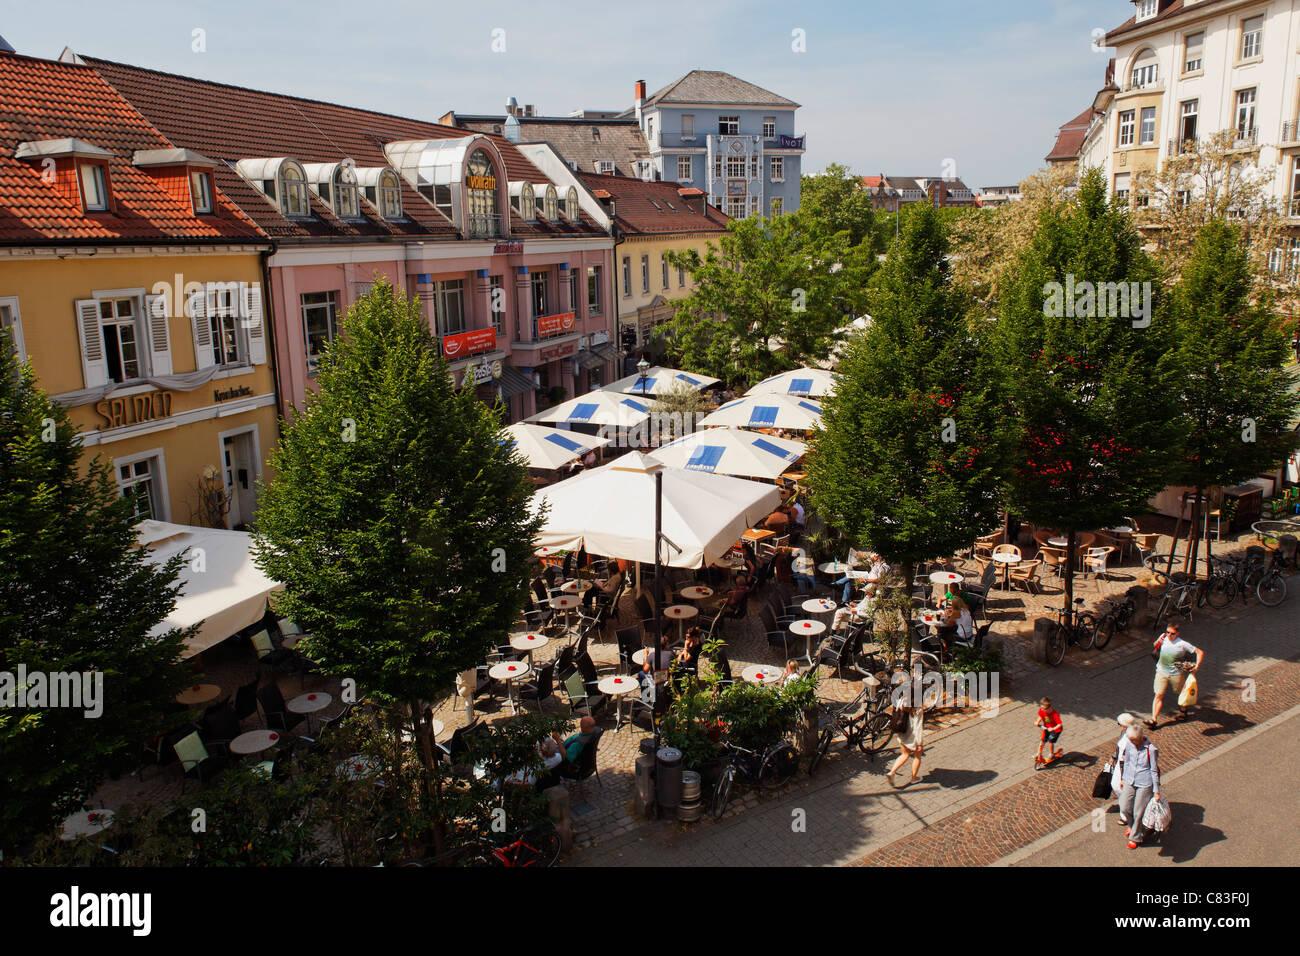 ludwigsplatz karlsruhe baden w rttemberg germany stock. Black Bedroom Furniture Sets. Home Design Ideas